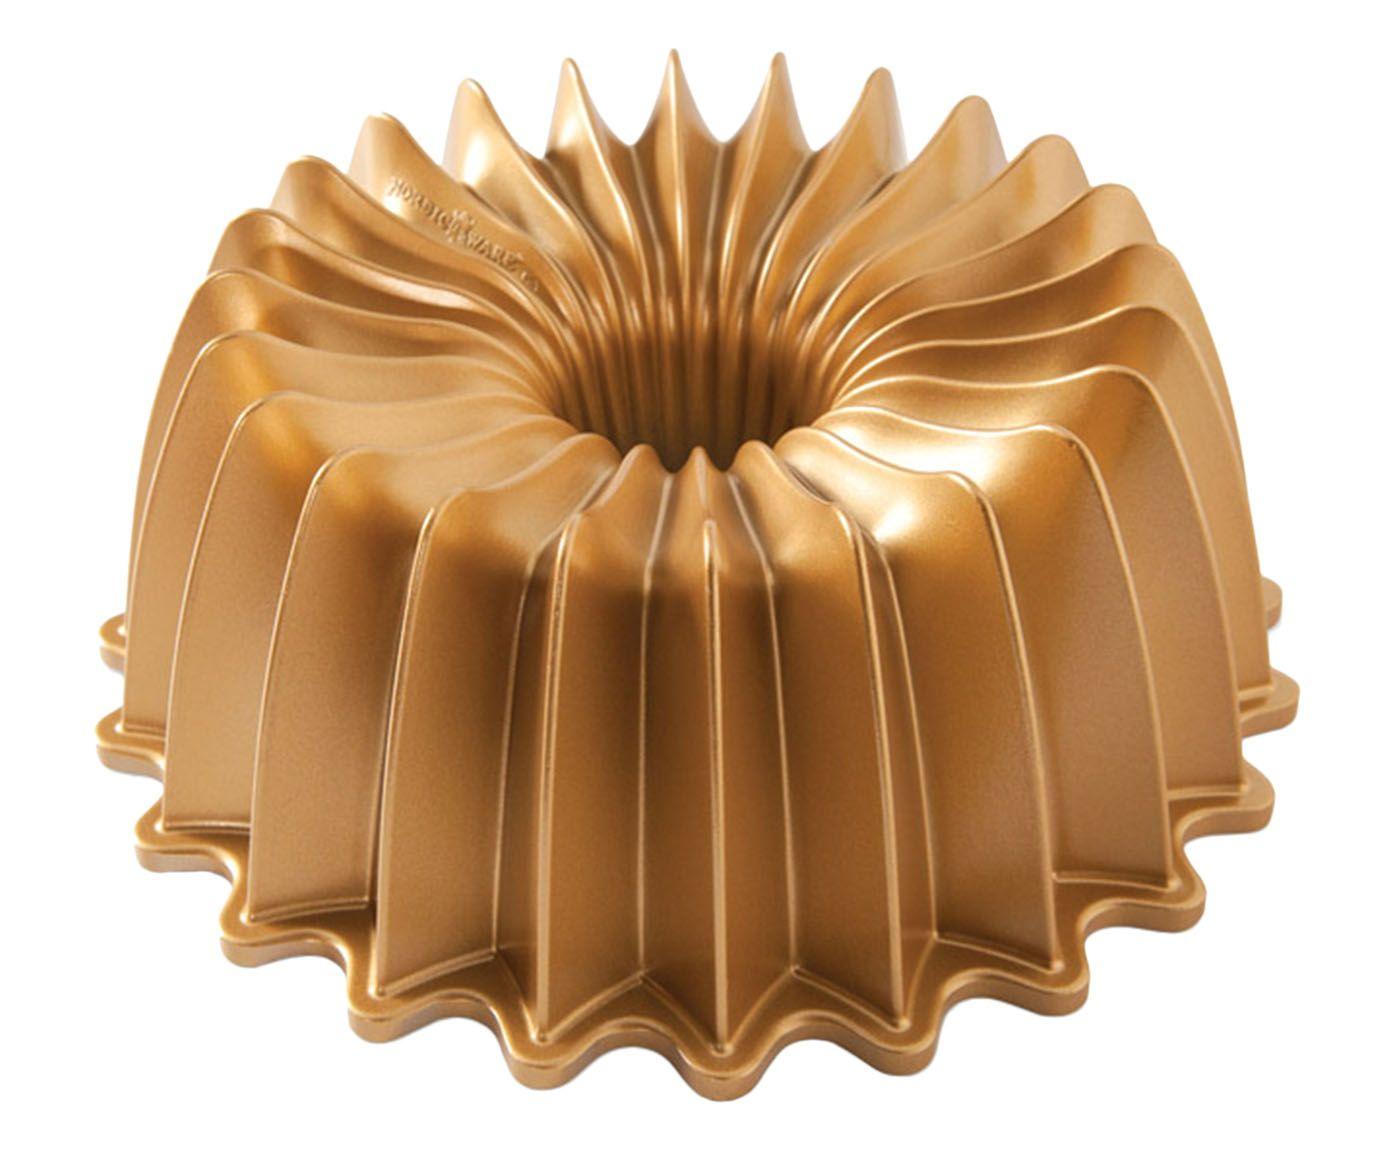 Forma para Bolo Gold Brilliance Bundt - 26cm | Westwing.com.br